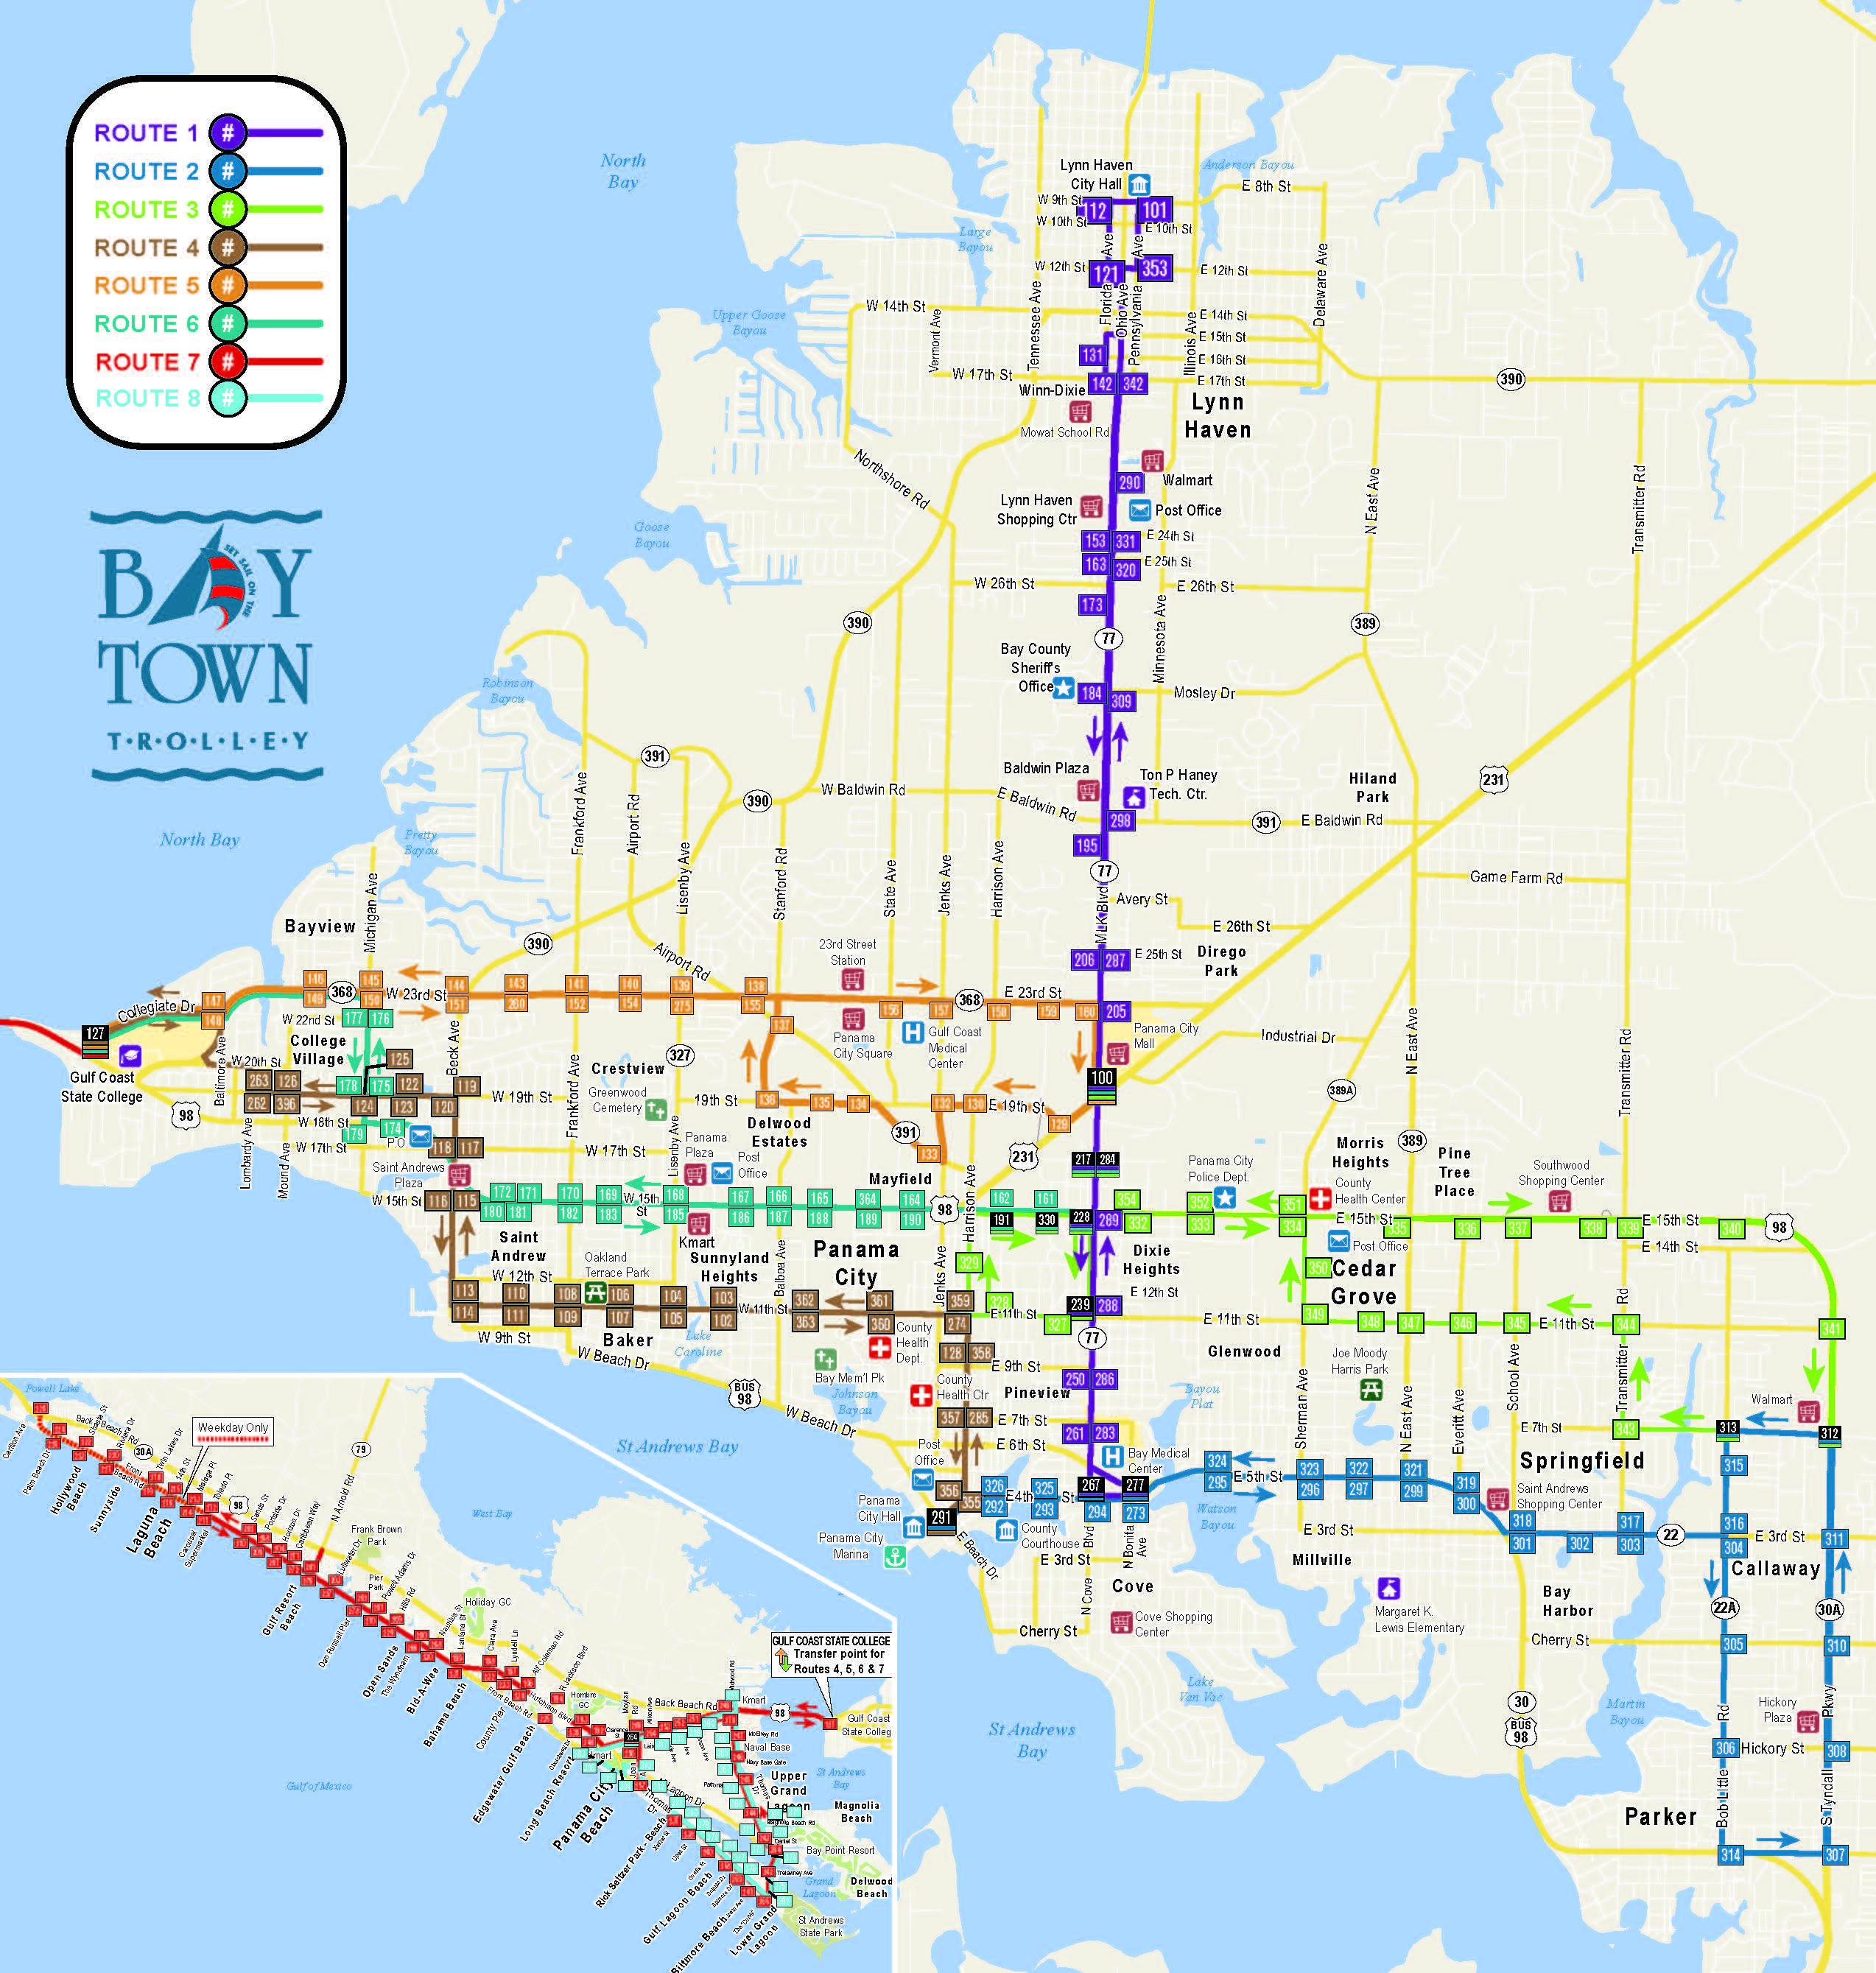 Transportation Bay County Chamber Of Commerce New Map Panama City - Map Of Panama City Florida And Surrounding Towns